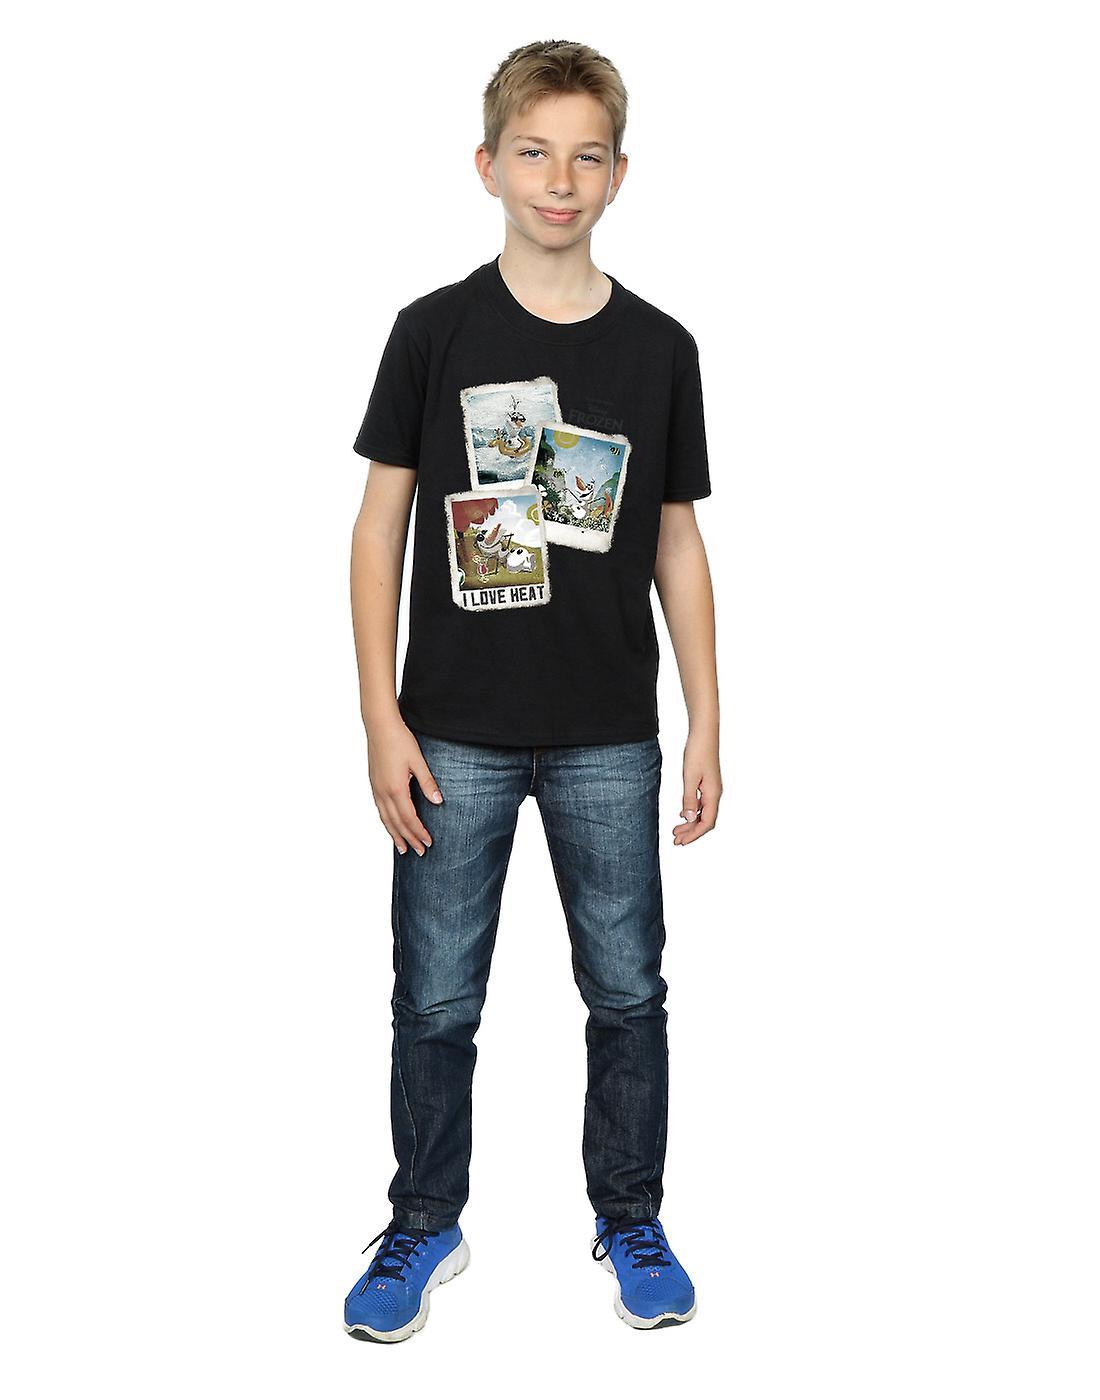 d2b57a2740cee0 Disney Boys Frozen Olaf Polaroid T-Shirt   Fruugo